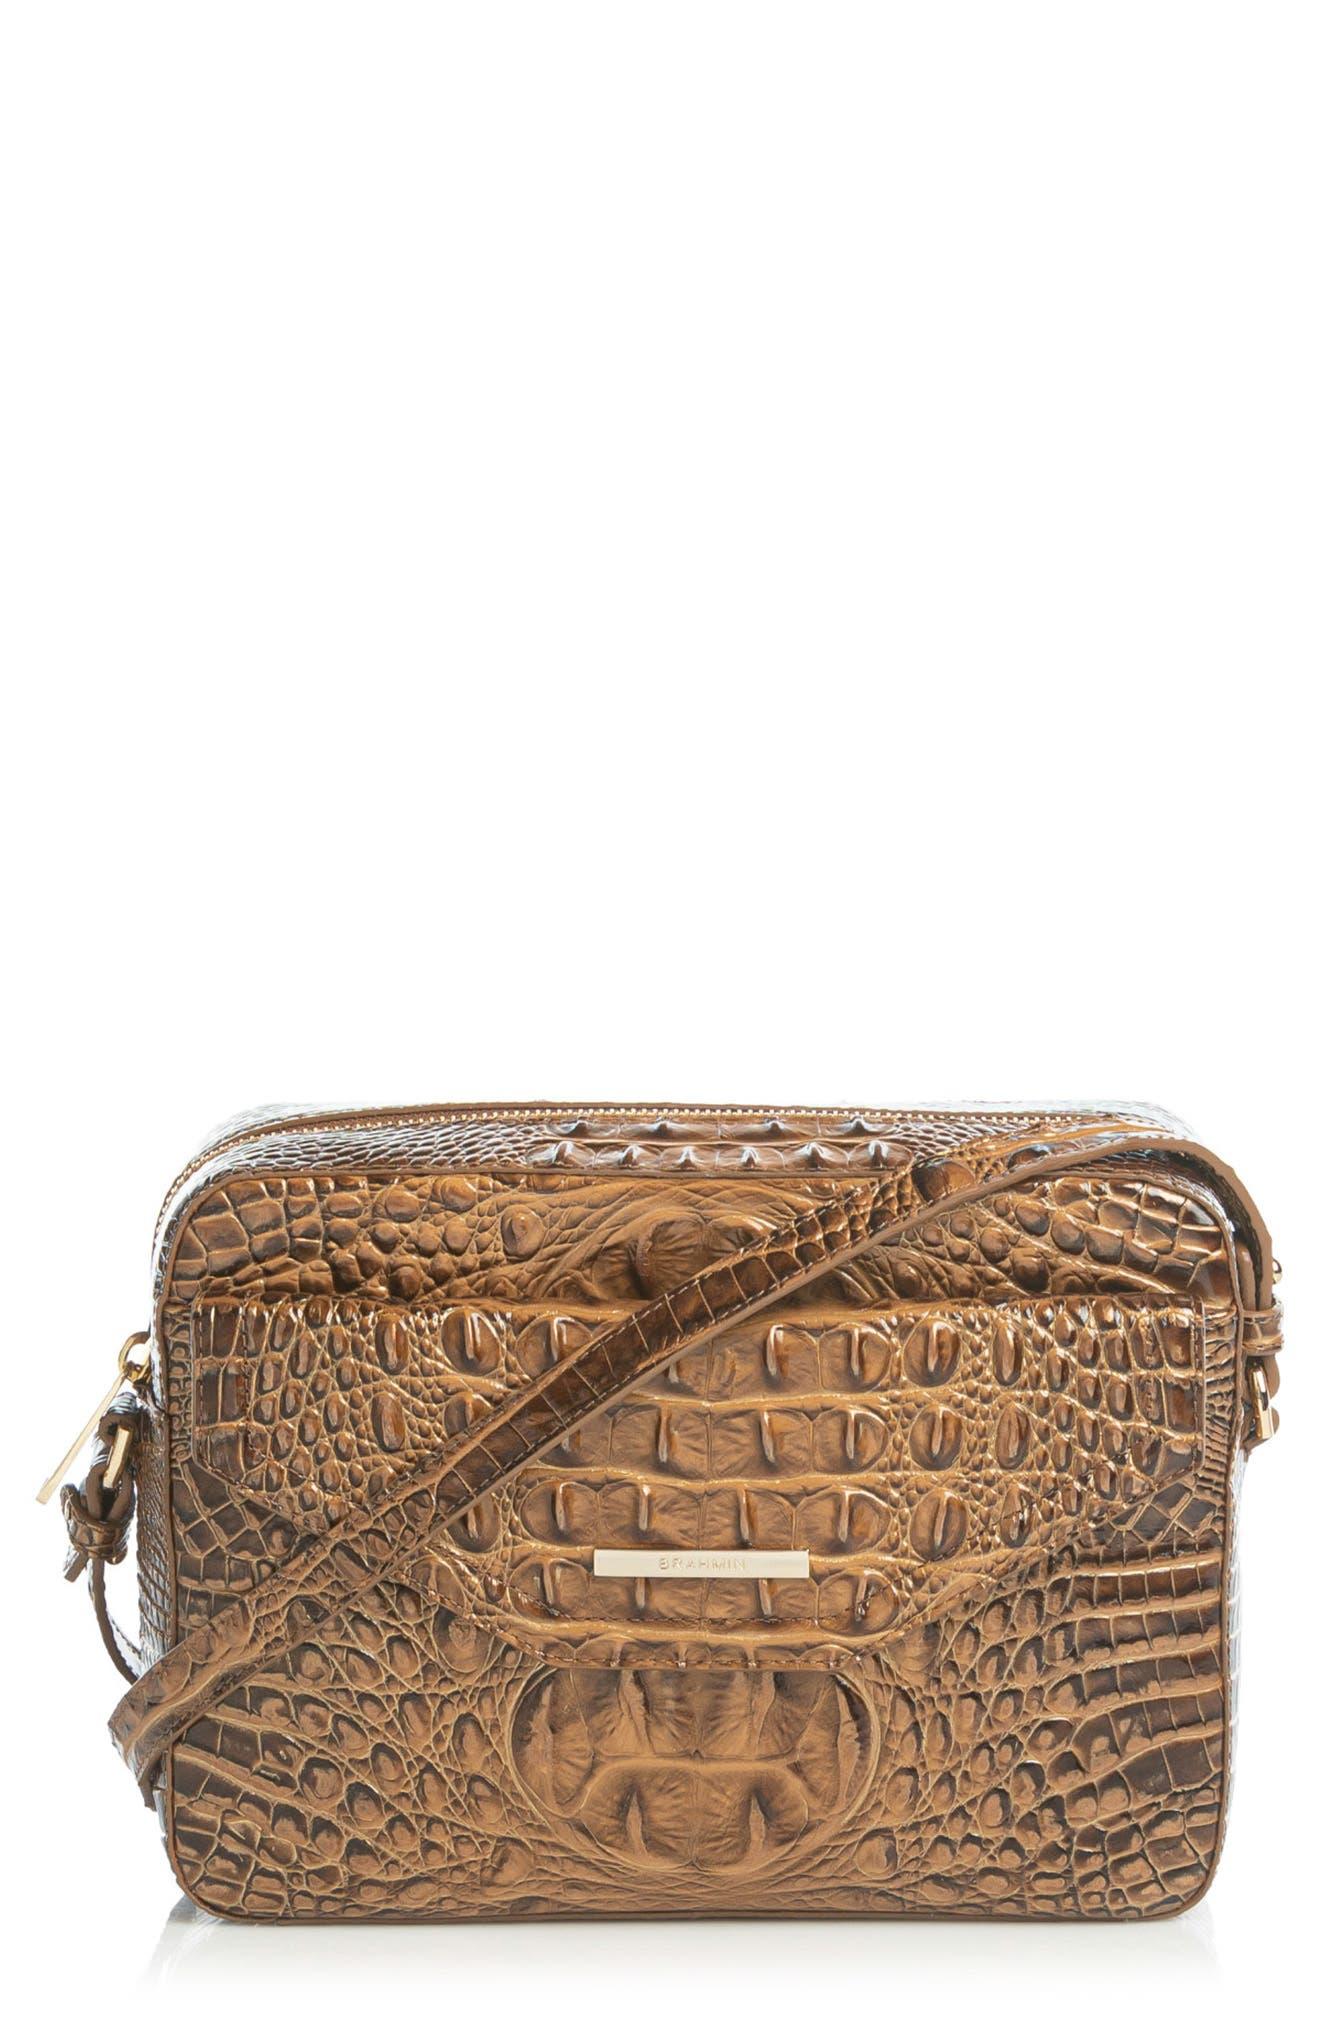 Shea Croc Embossed Leather Crossbody Bag